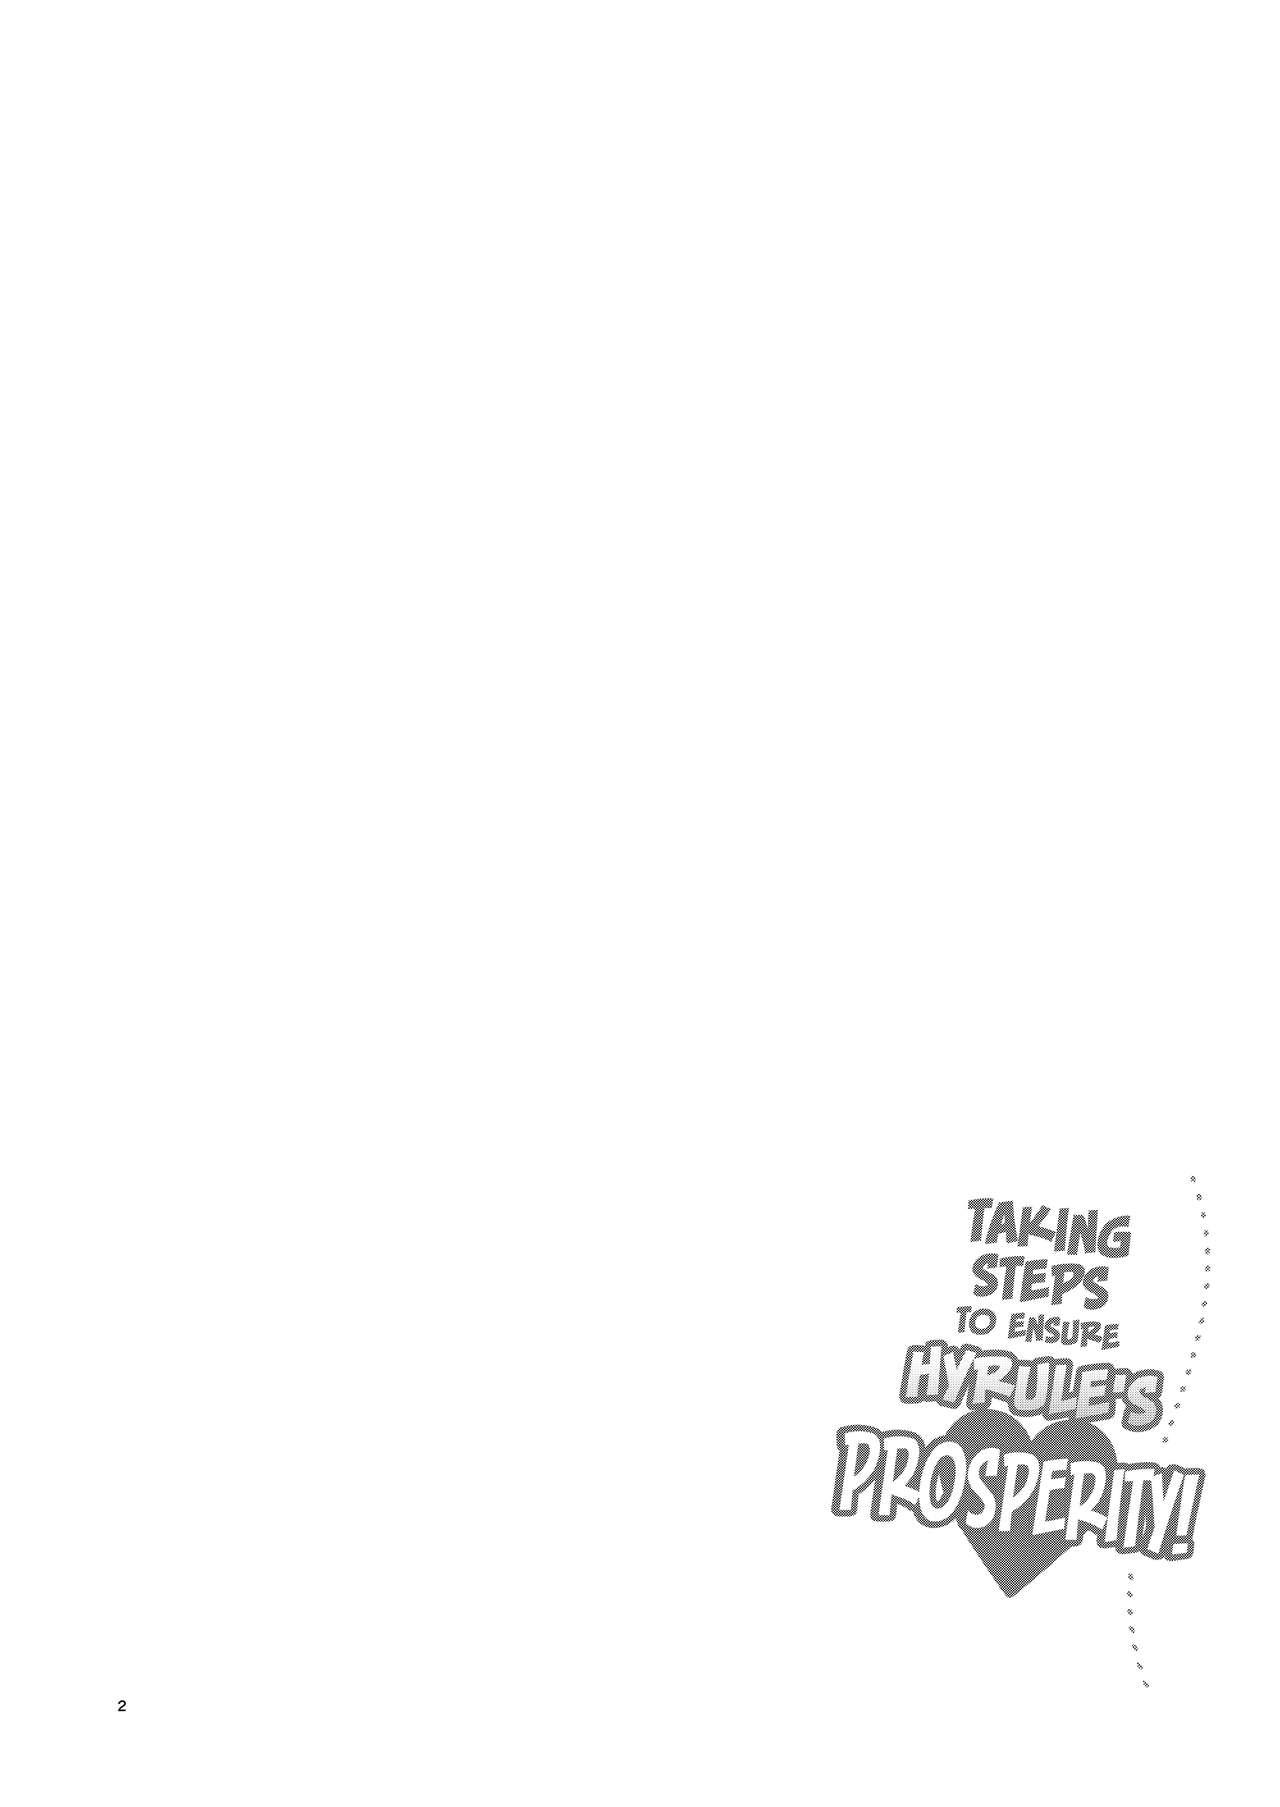 Hyrule Hanei no Tame no Katsudou!   Taking Steps to Ensure Hyrule's Prosperity! 2